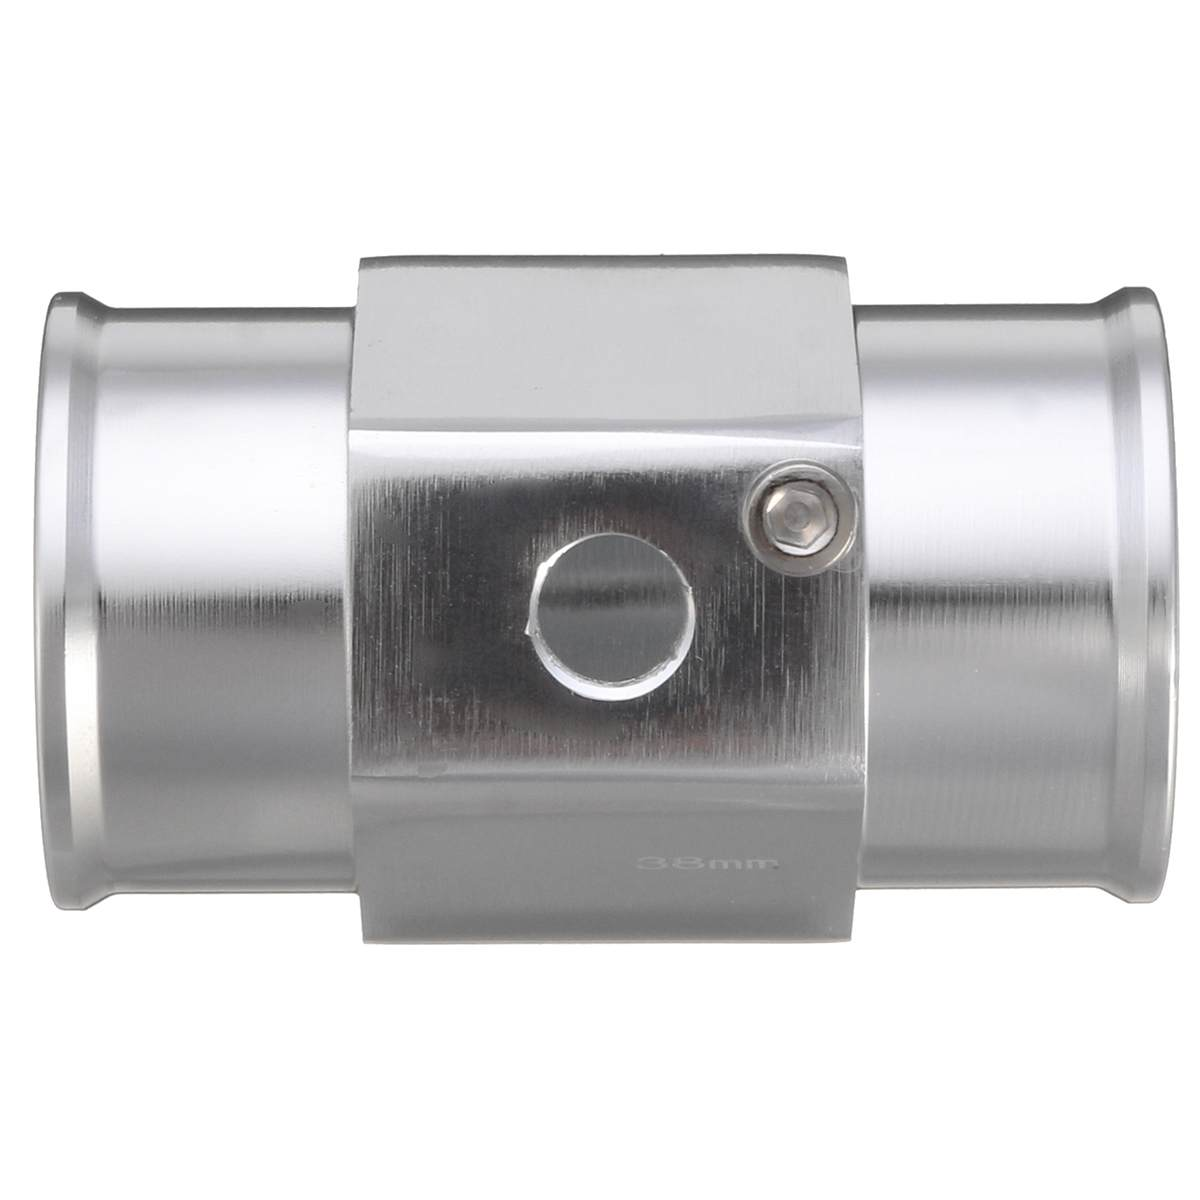 32mm Car Water Temp Joint Pipe Radiator Hose Temperature Gauge Sensor Adapter XM